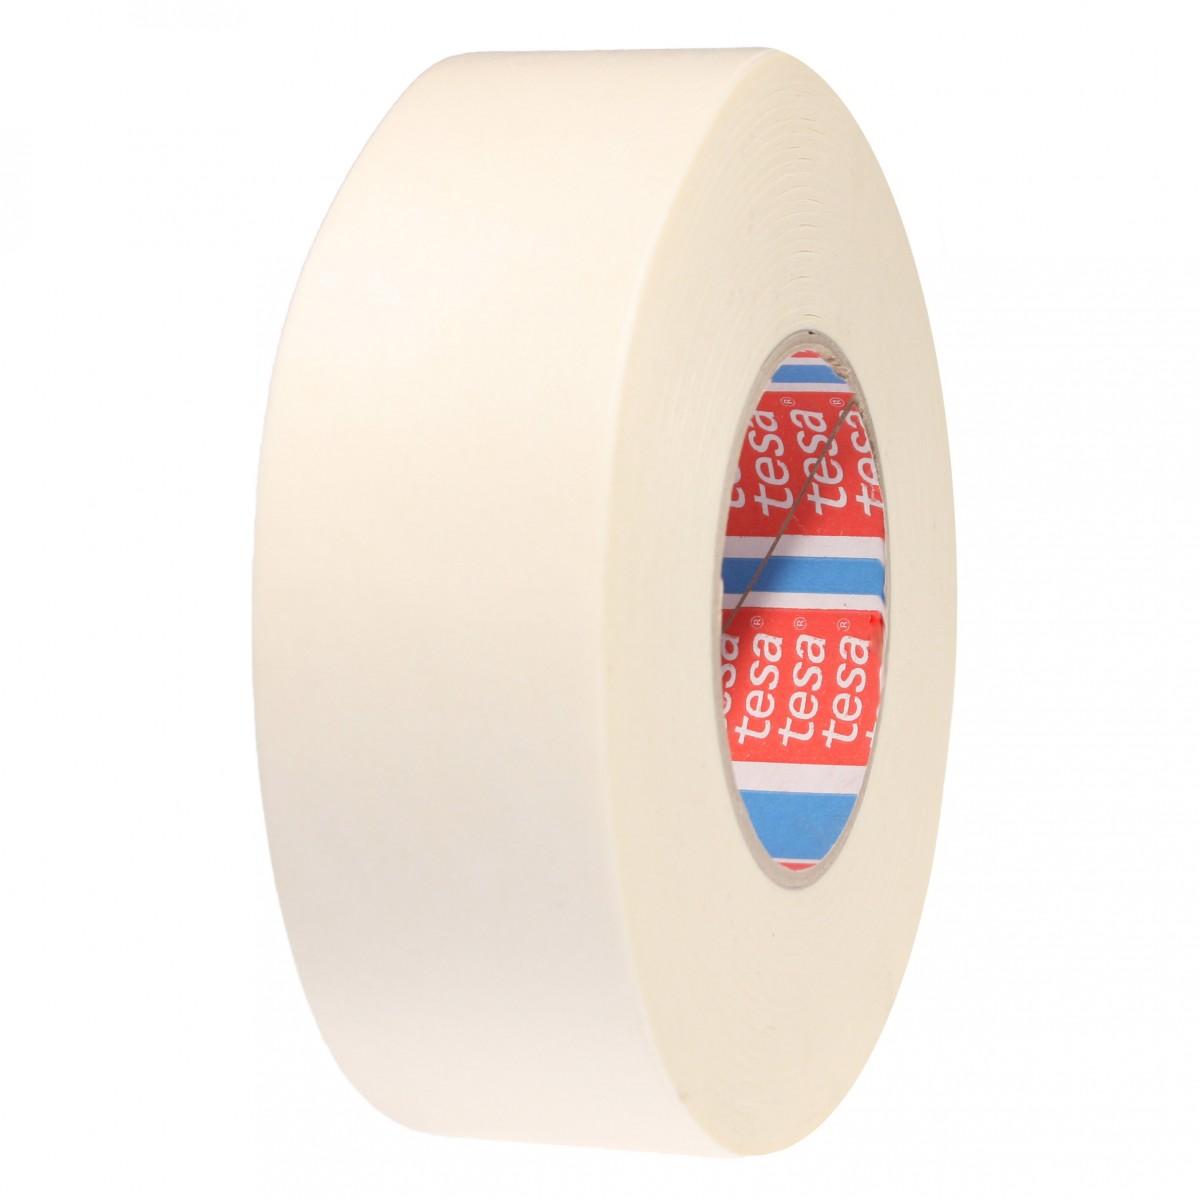 Tesa 4432 Sandblast Masking Tape 150mm x 25m